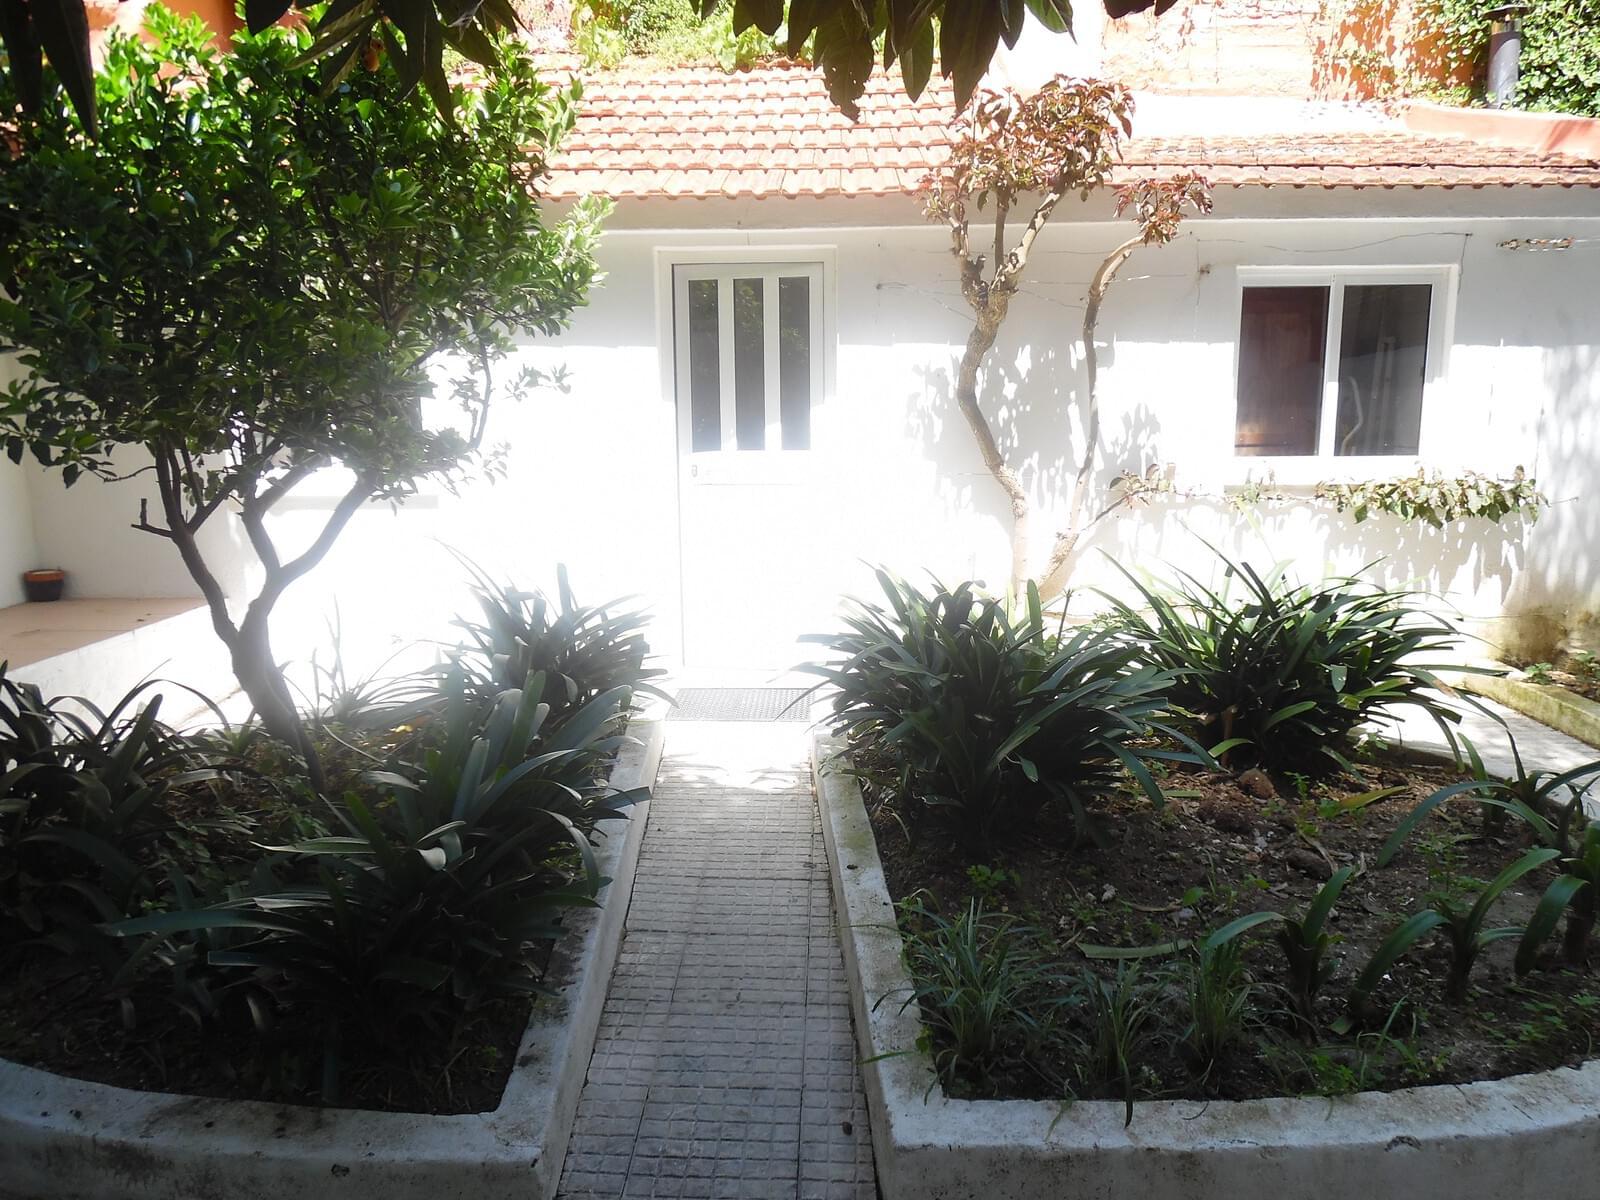 pf17147-apartamento-t2-lisboa-beda40f2-769e-4947-a780-04686f38b630